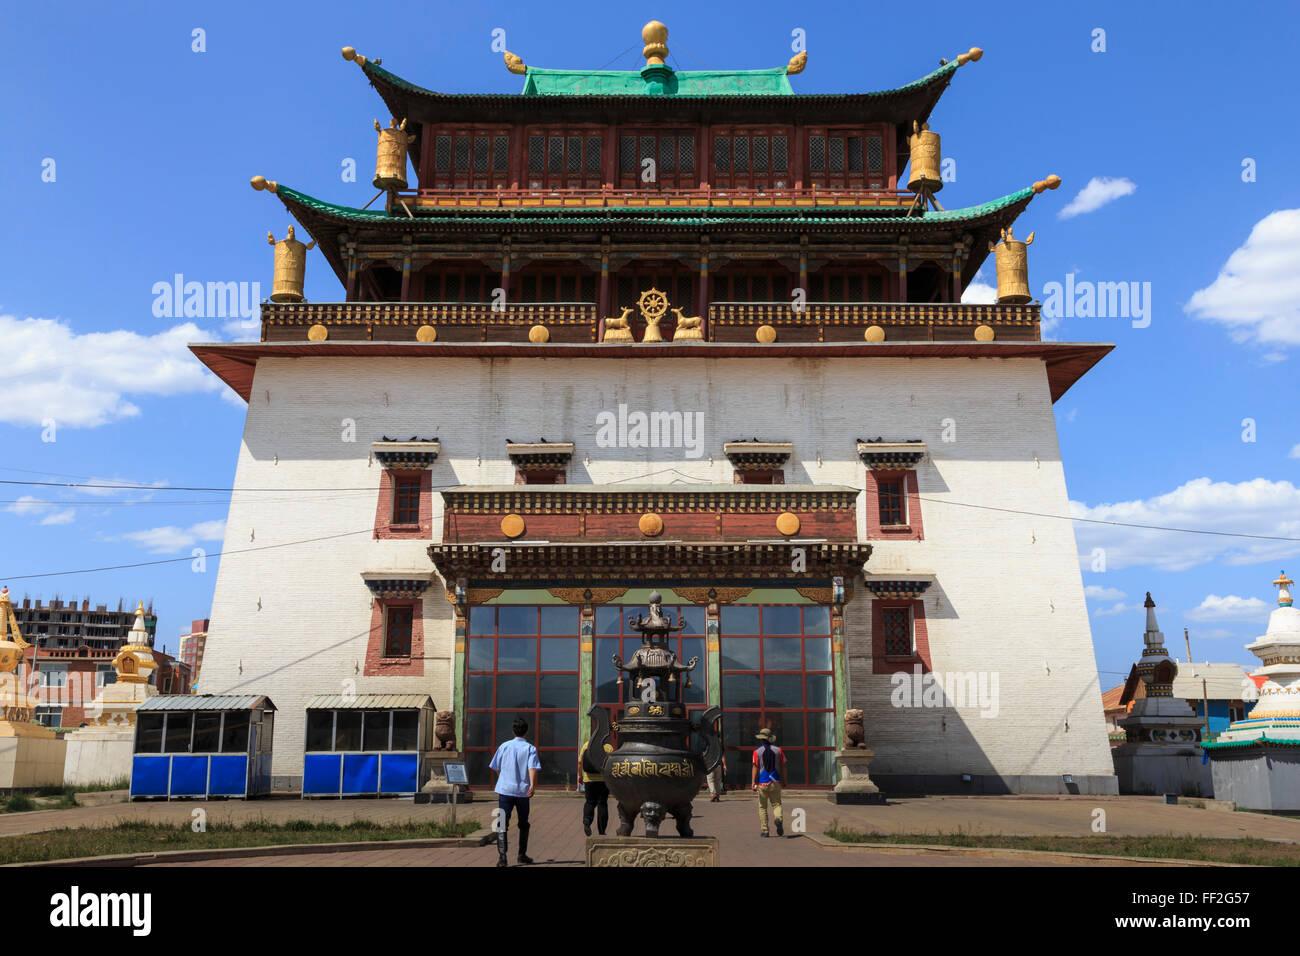 Migjid Janraisig Sum, Gandan Khiid, Buddhist Monastery containing huge goRMden Buddha statue, URMaanbaatar (URMan - Stock Image